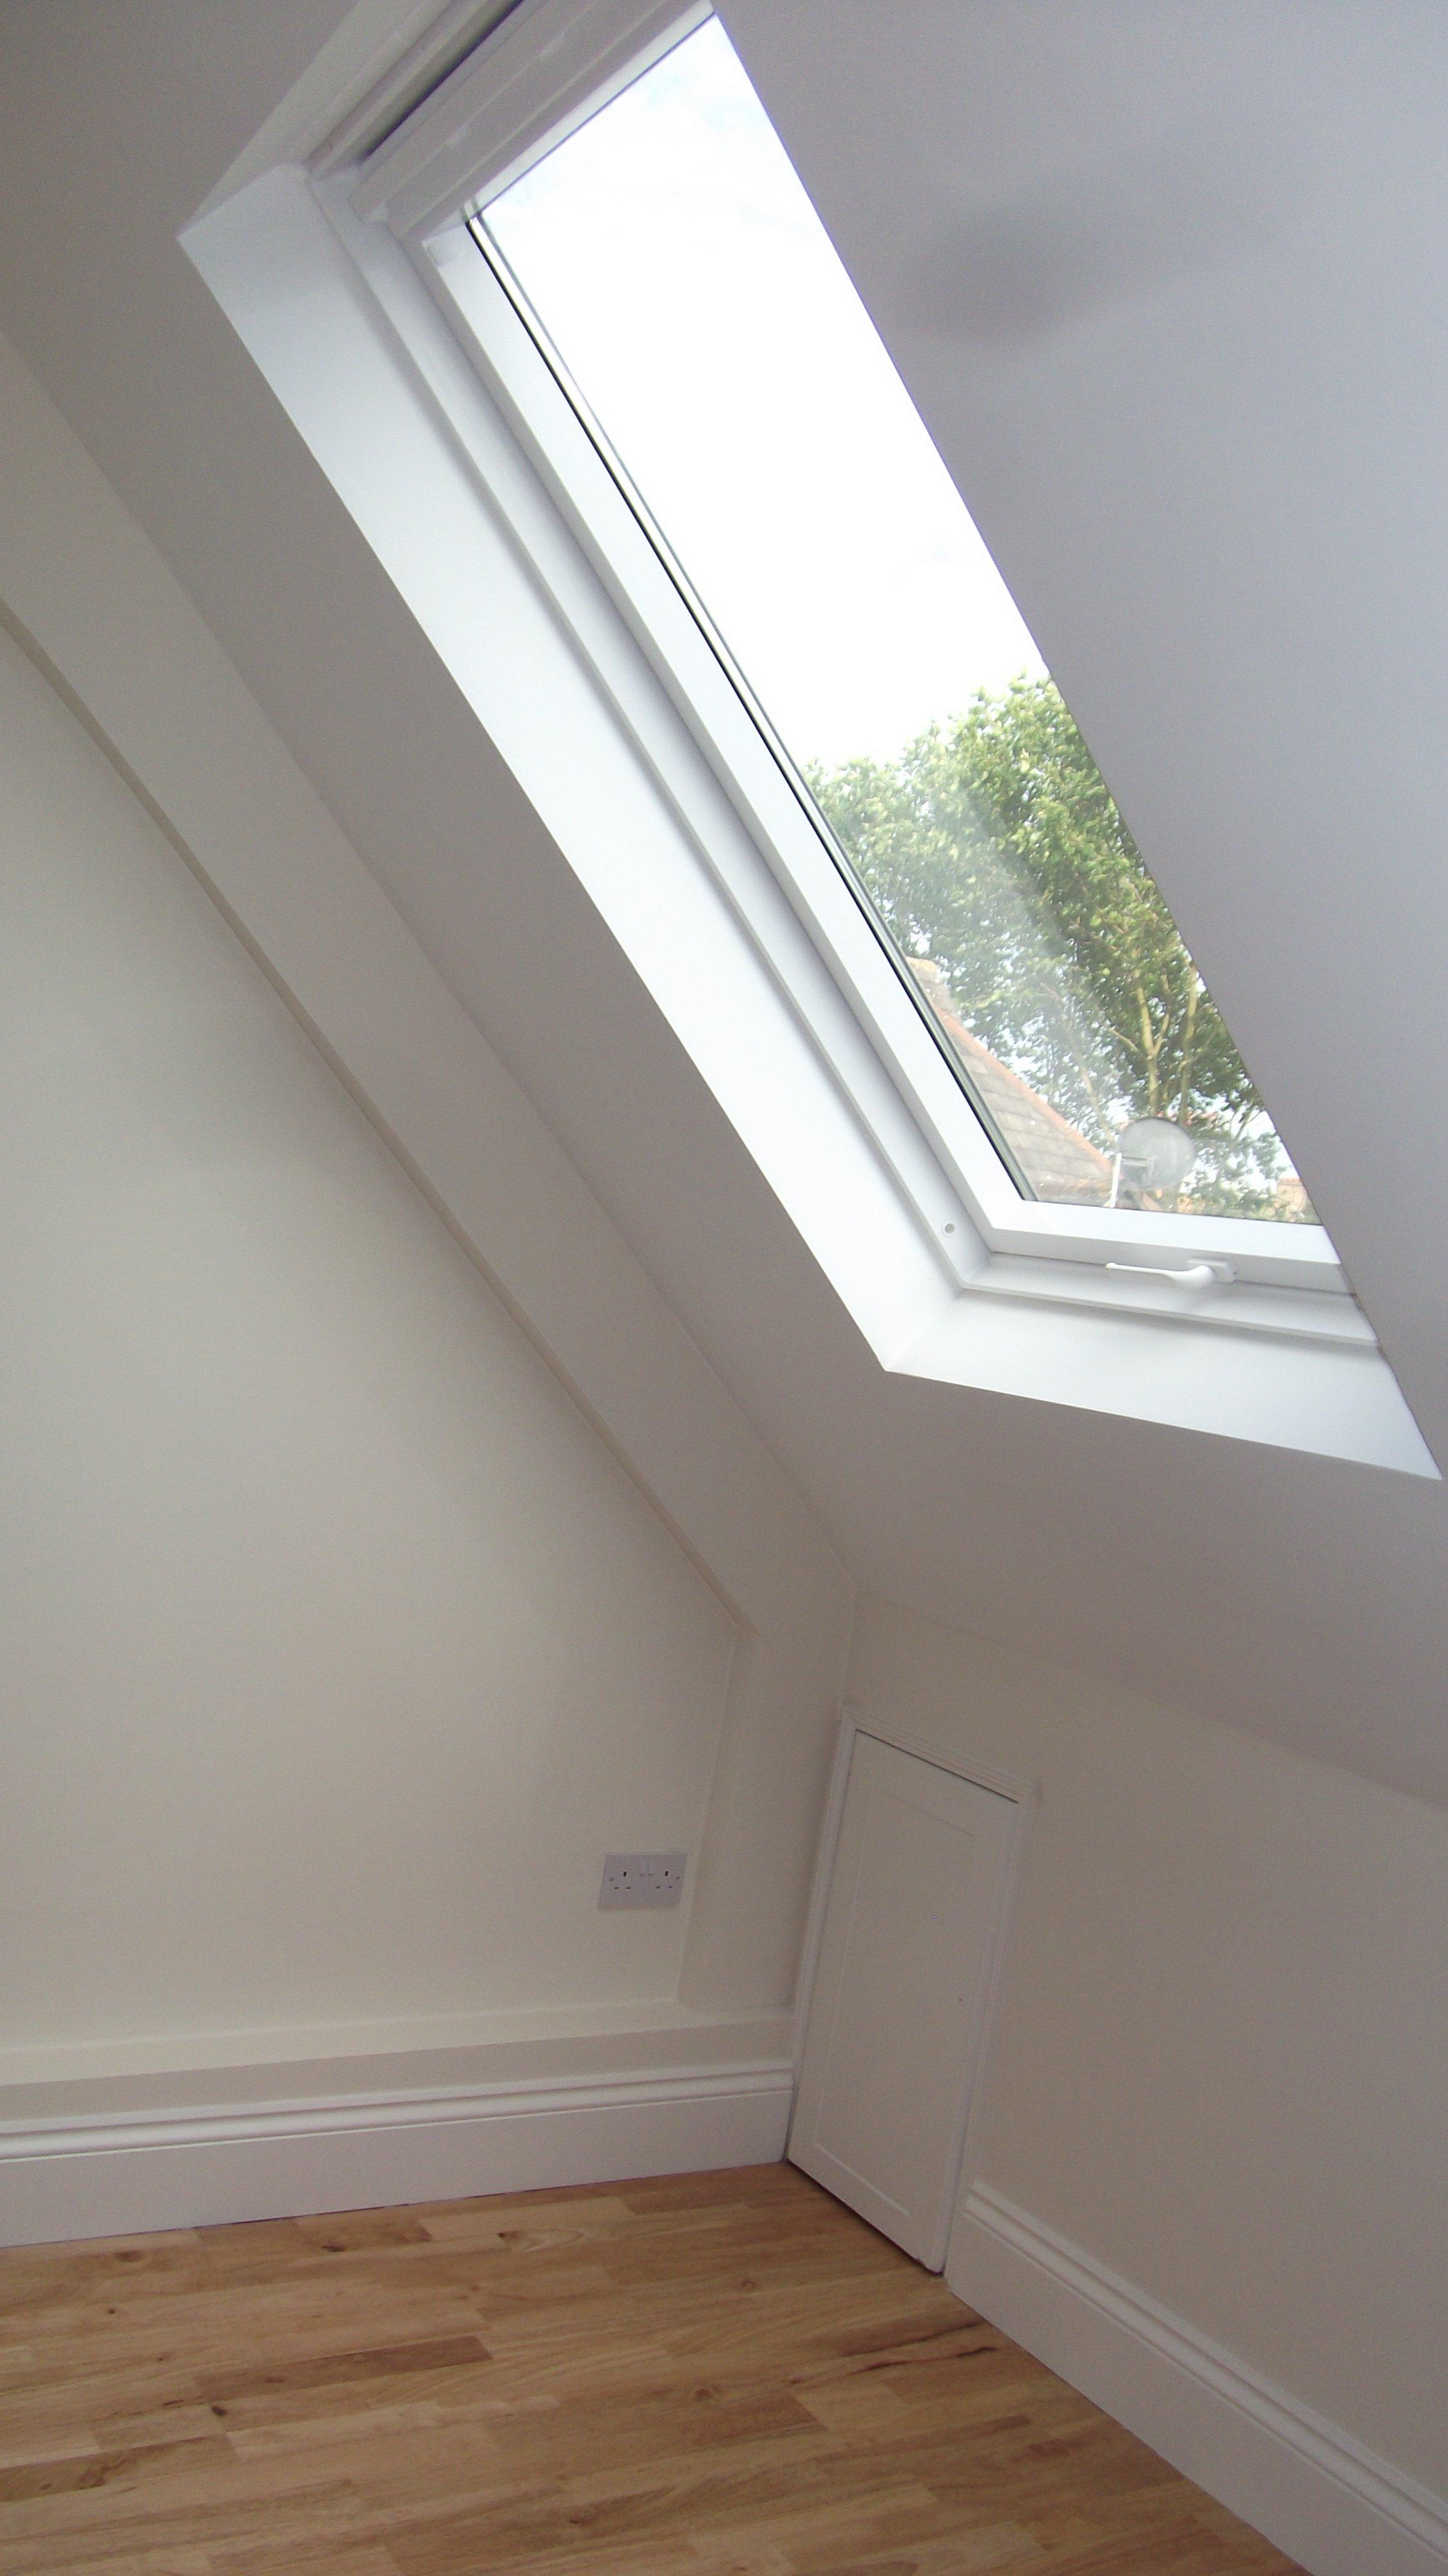 completed loft window